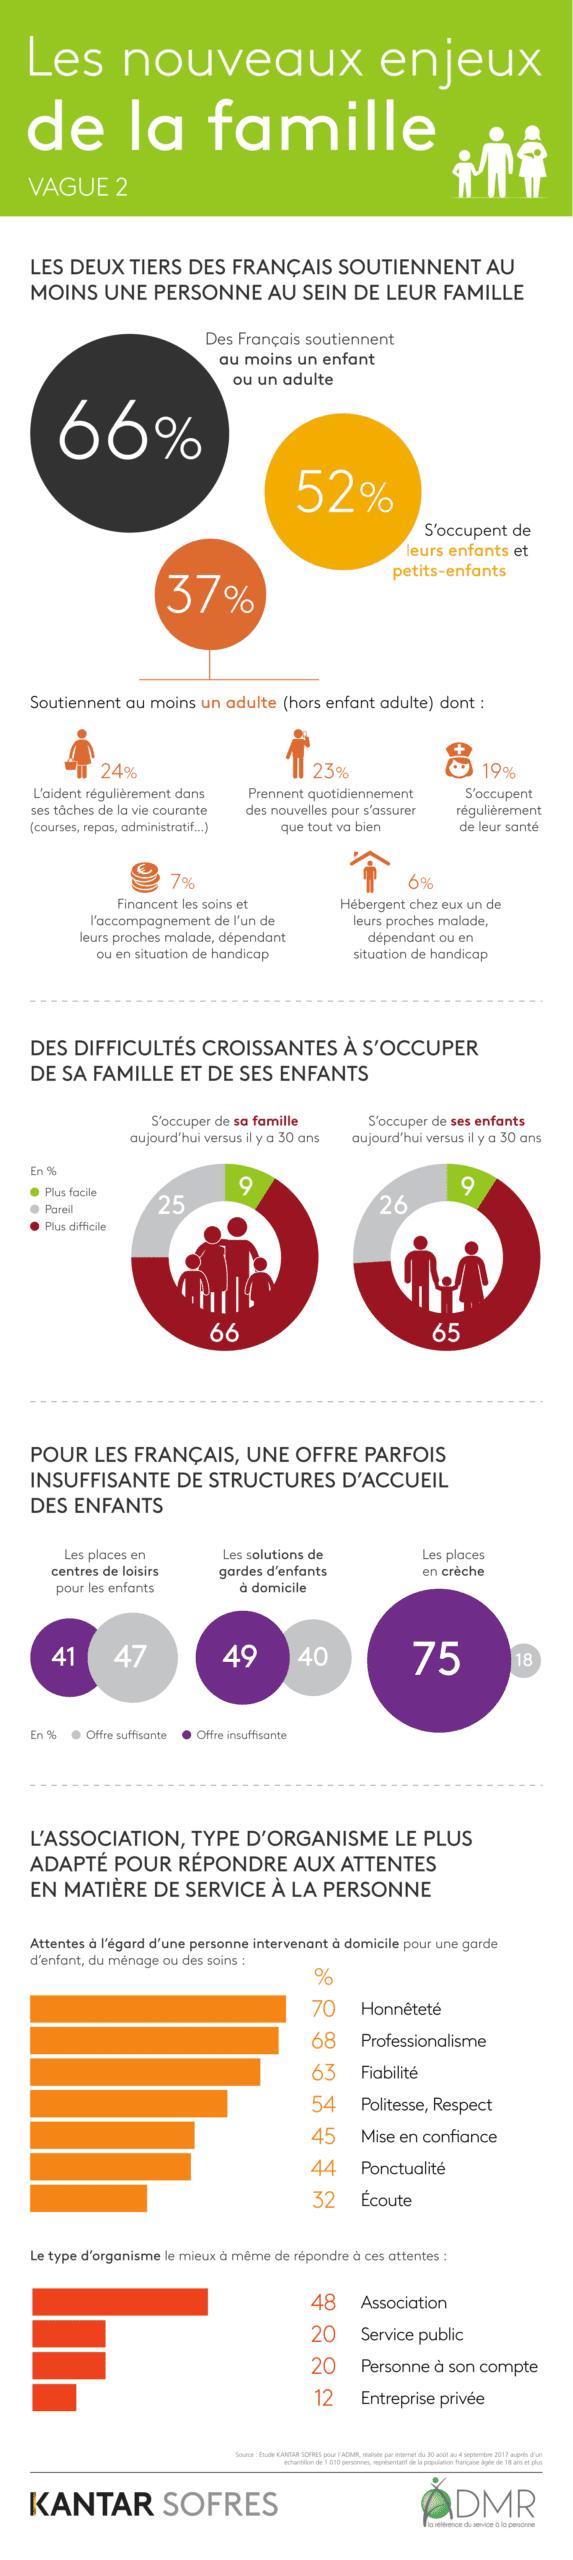 Infographie ADMR-Kantar-Sofres-2017-NouveauxEnjeuxDeLaFamille-1